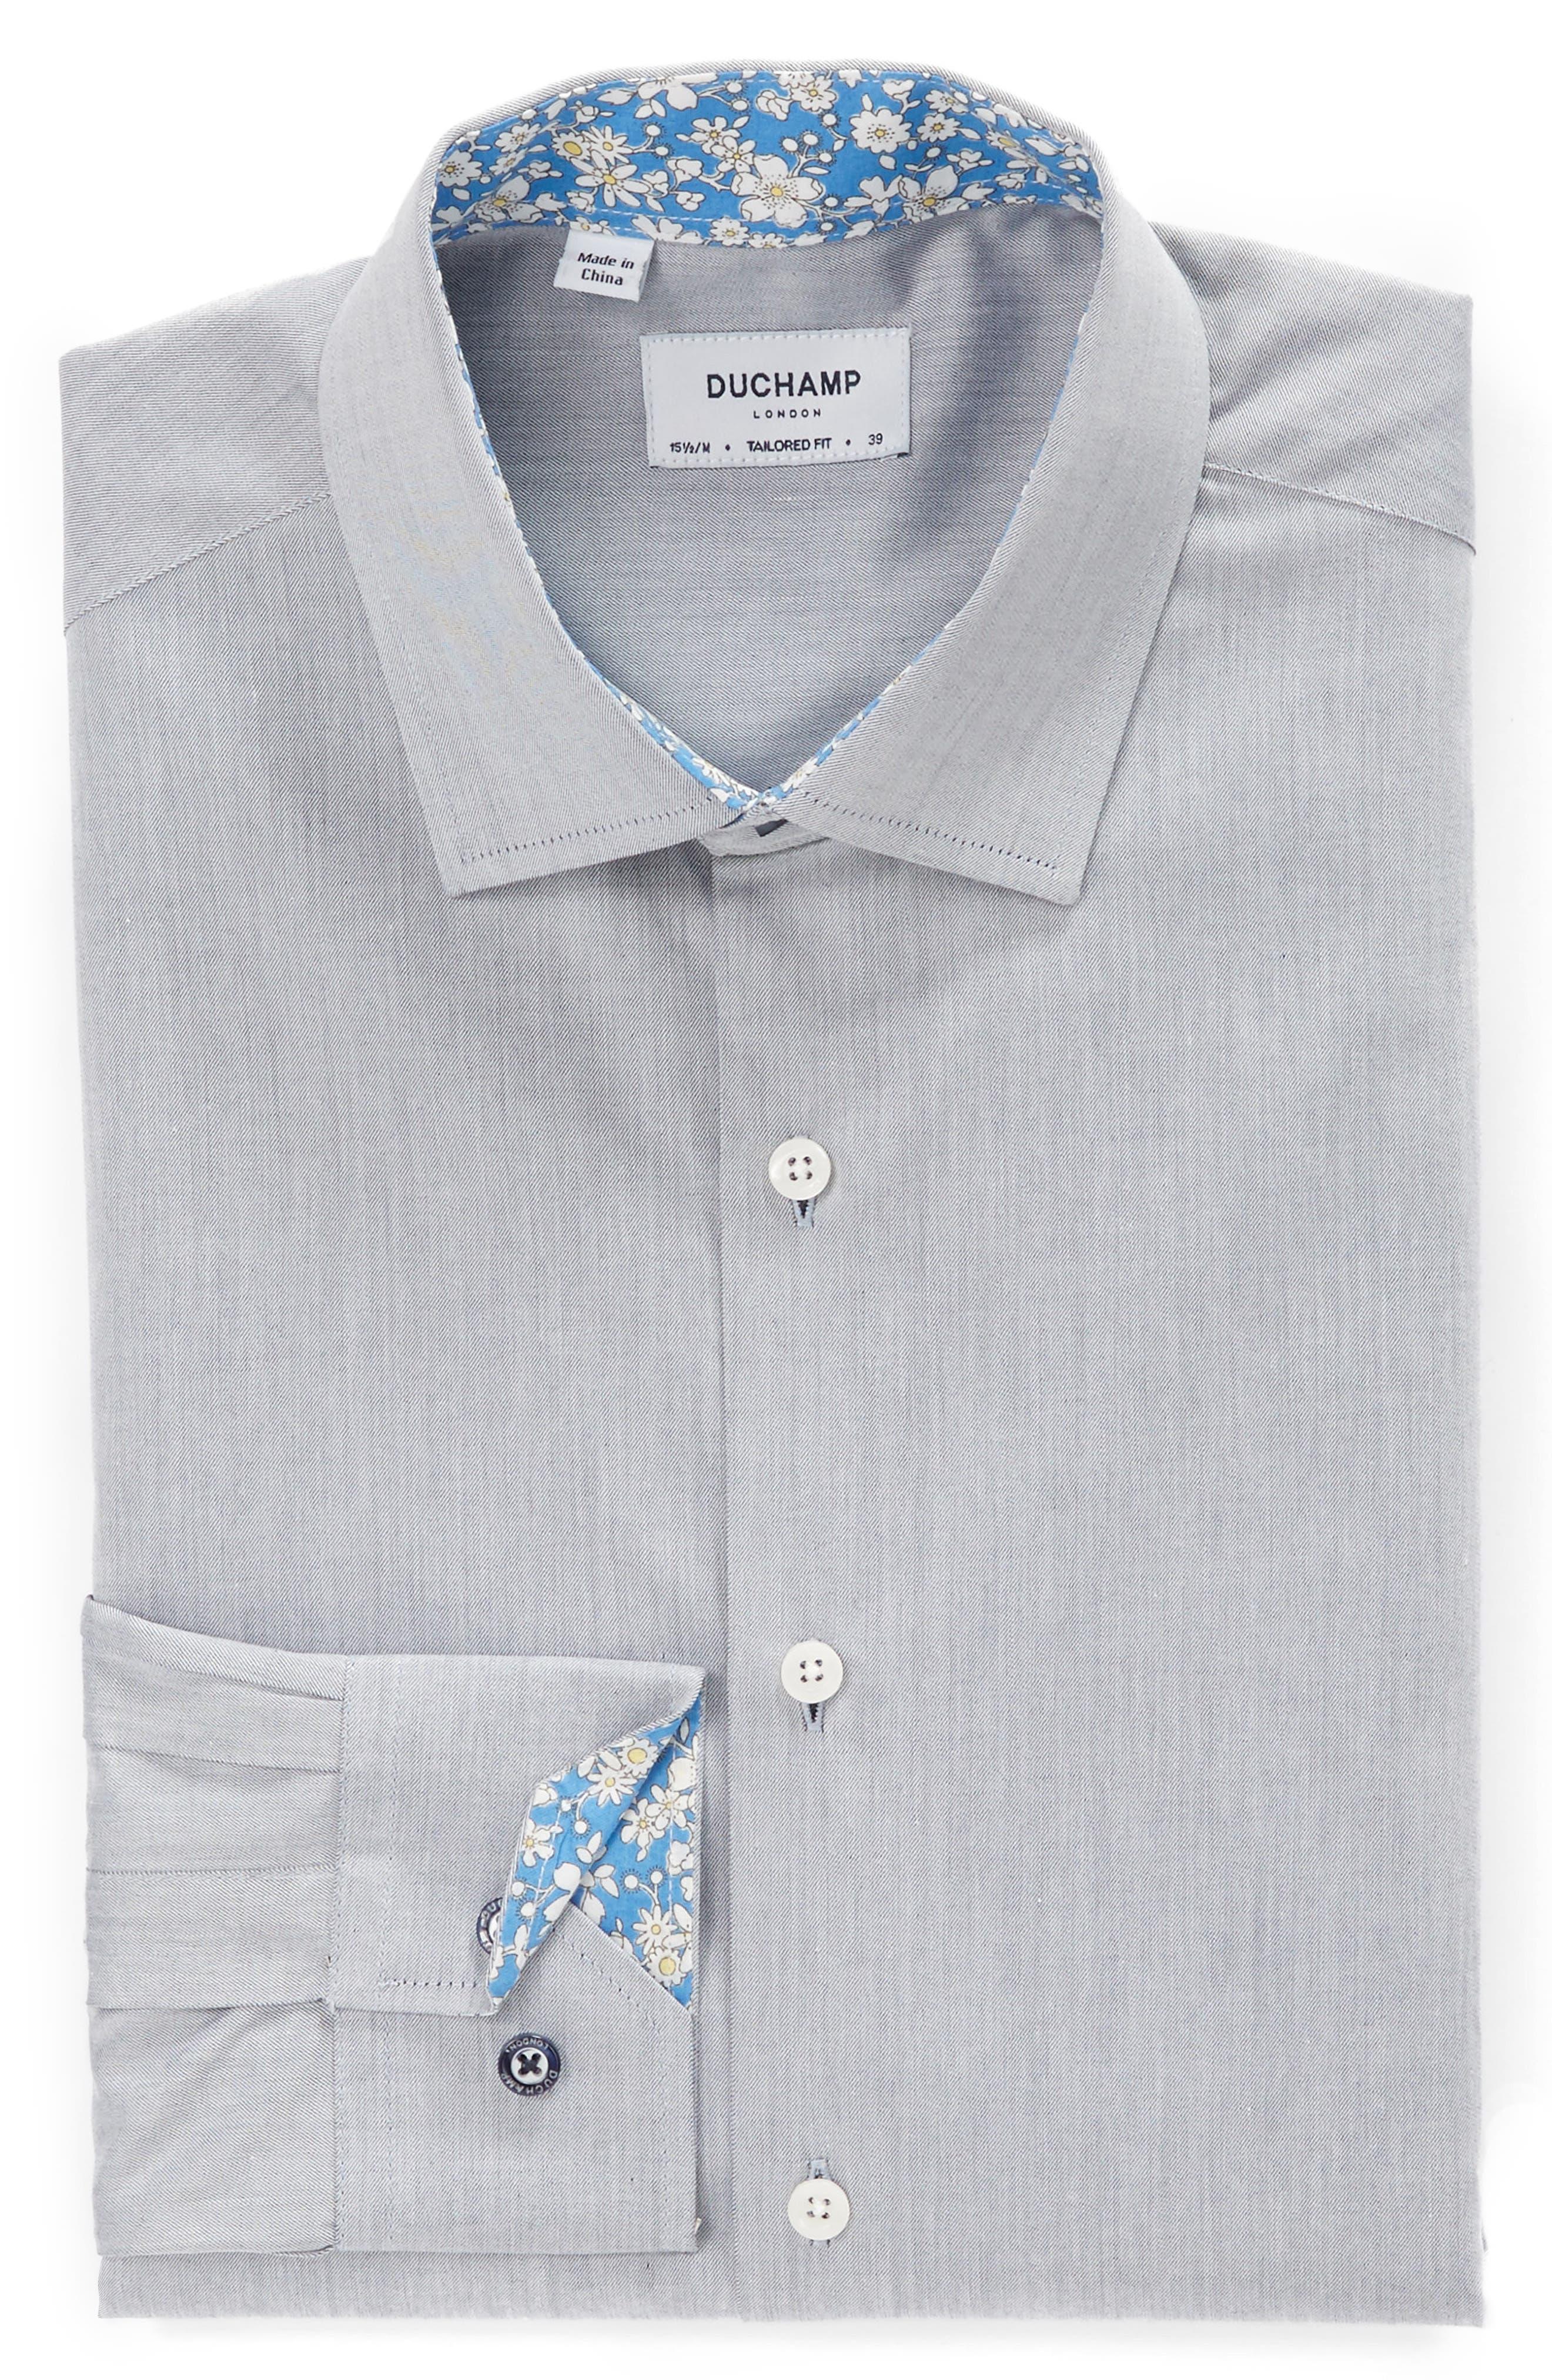 Trim Fit Solid Dress Shirt,                             Alternate thumbnail 3, color,                             GREY